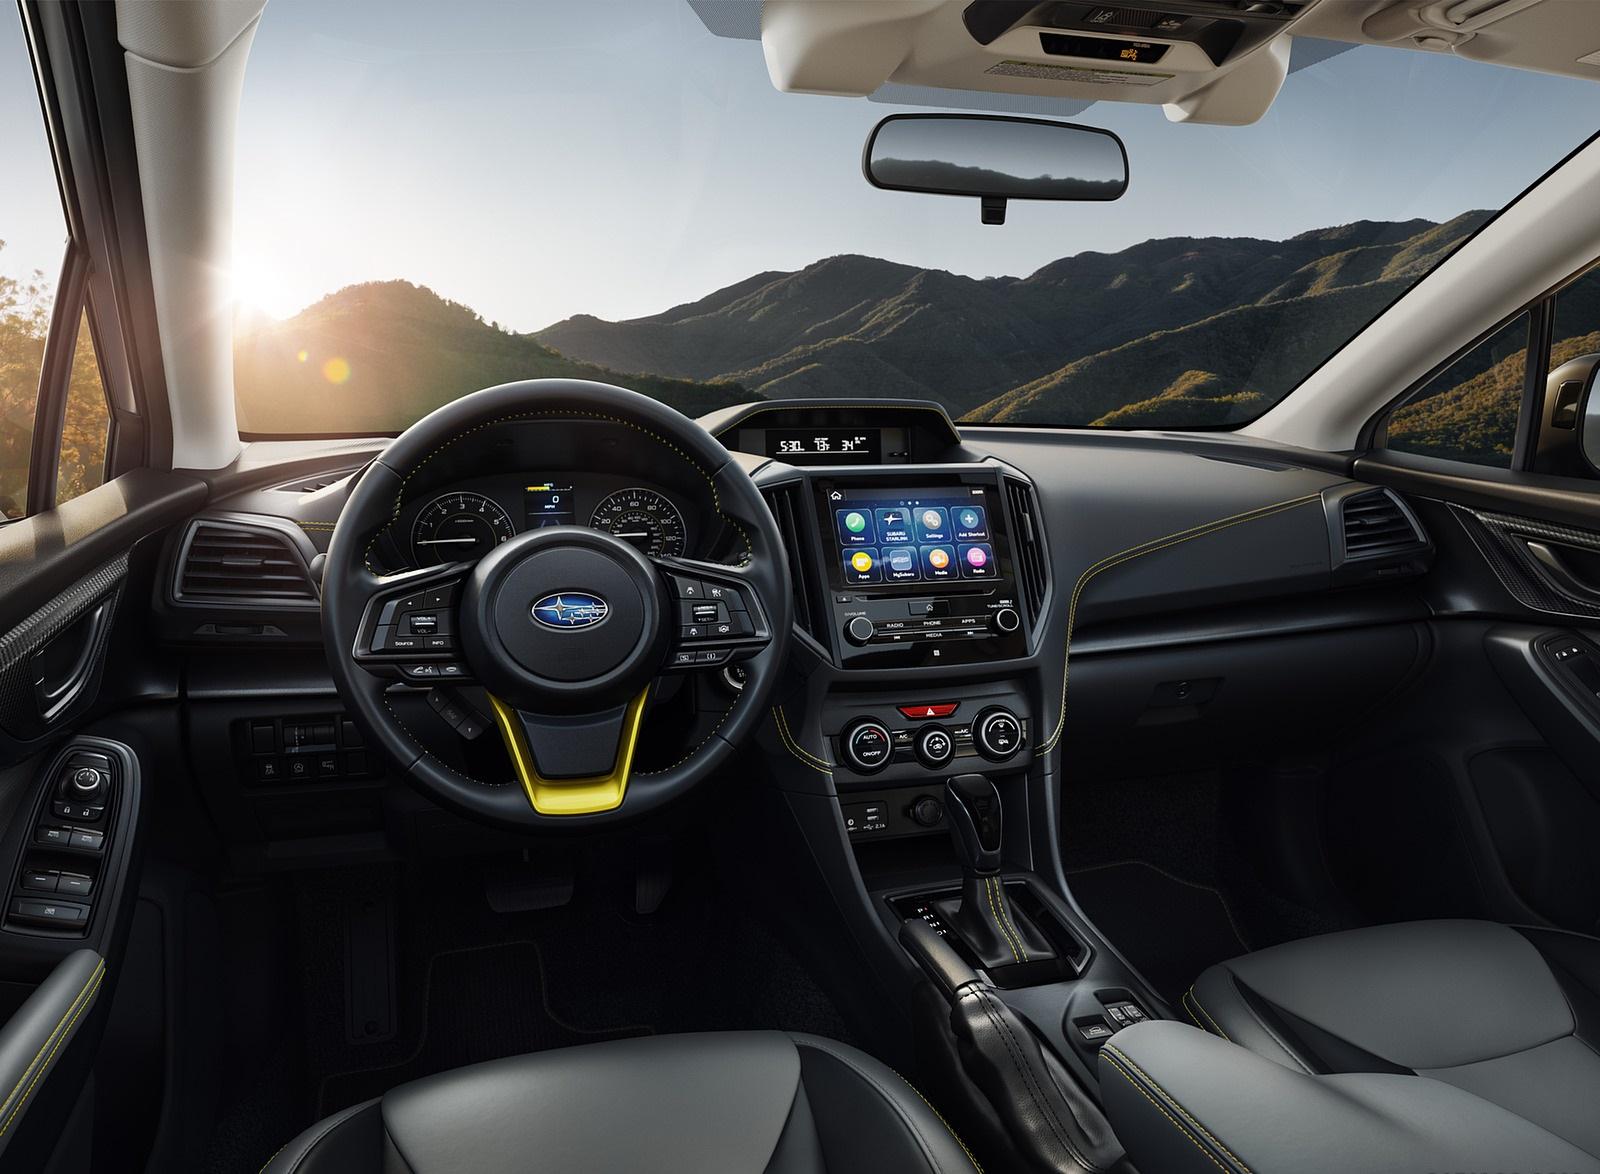 2021 Subaru Crosstrek Sport Interior Cockpit Wallpapers #12 of 12